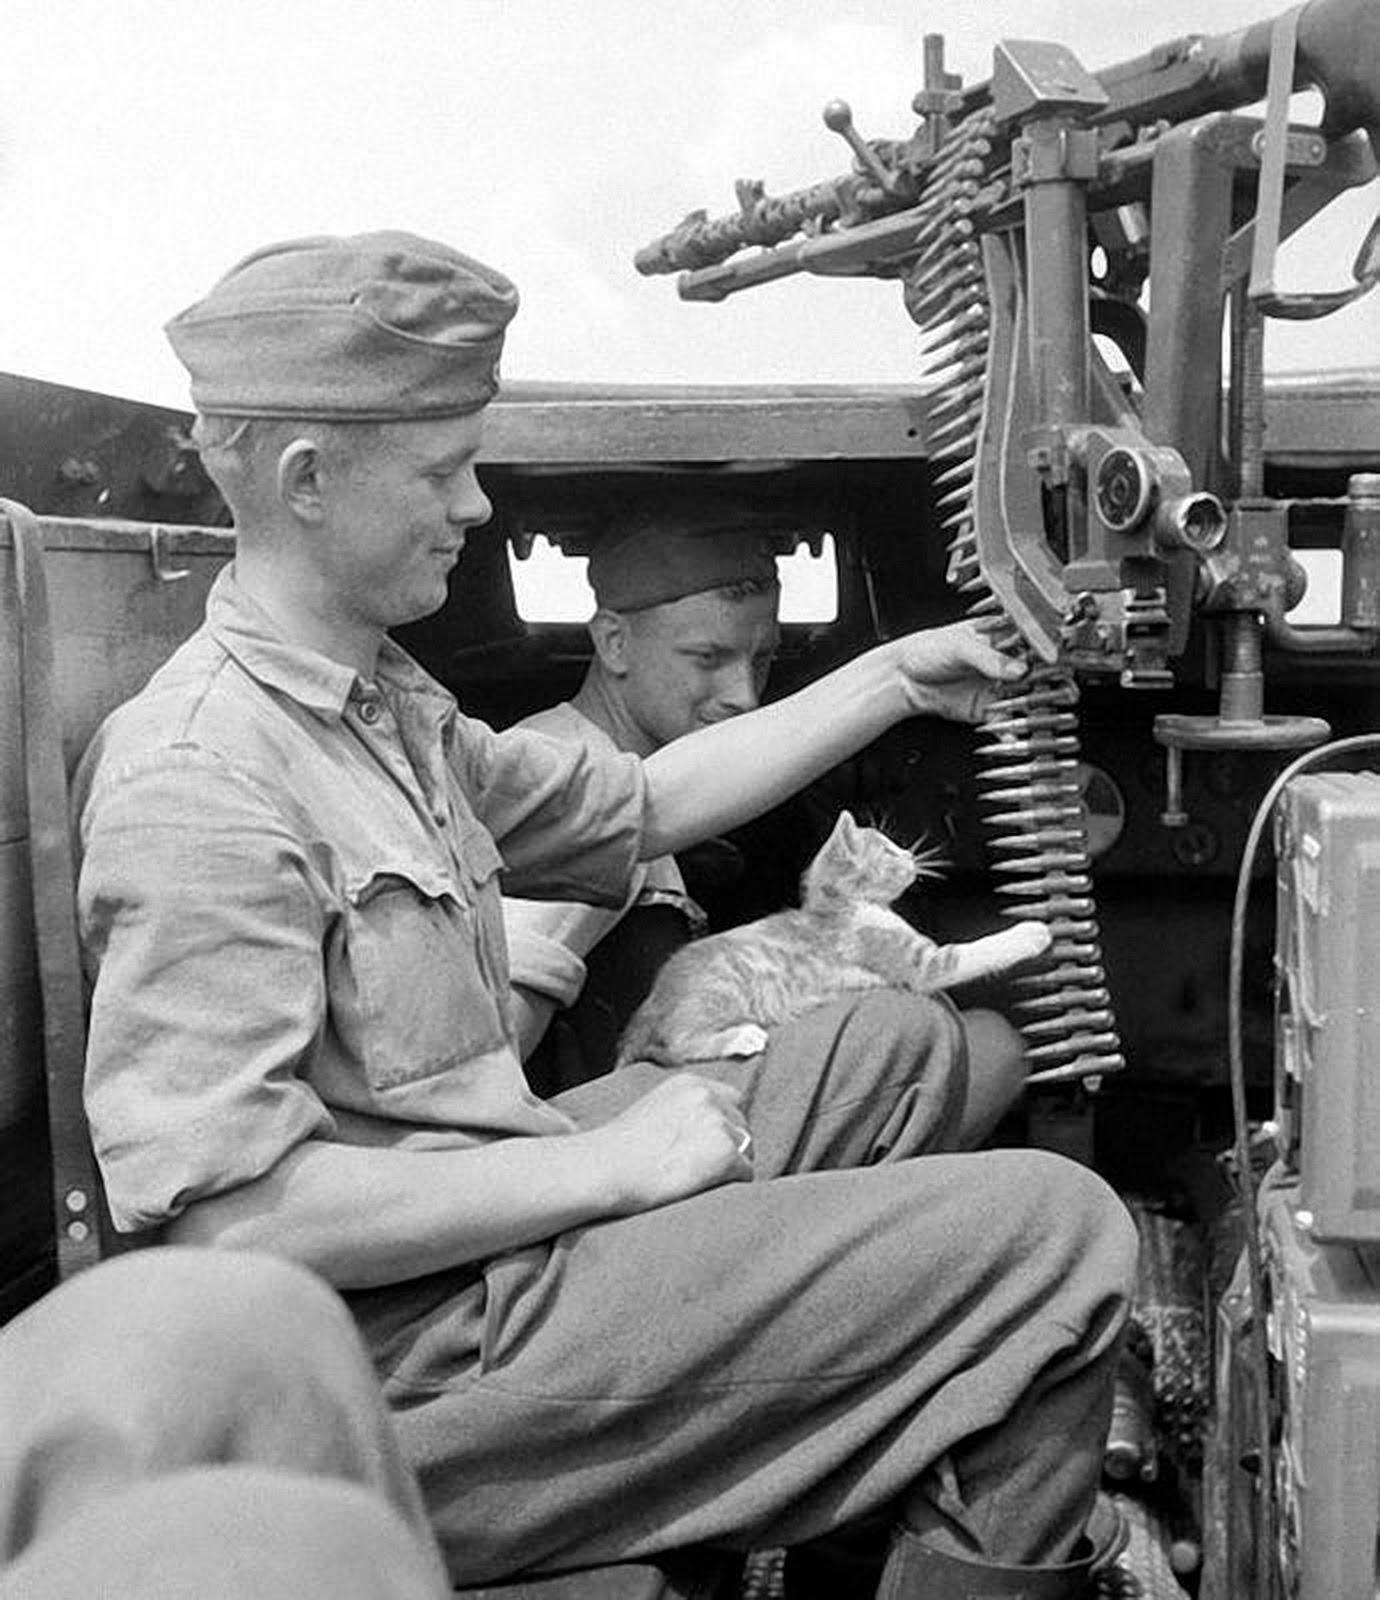 War: History In Photos: World War II